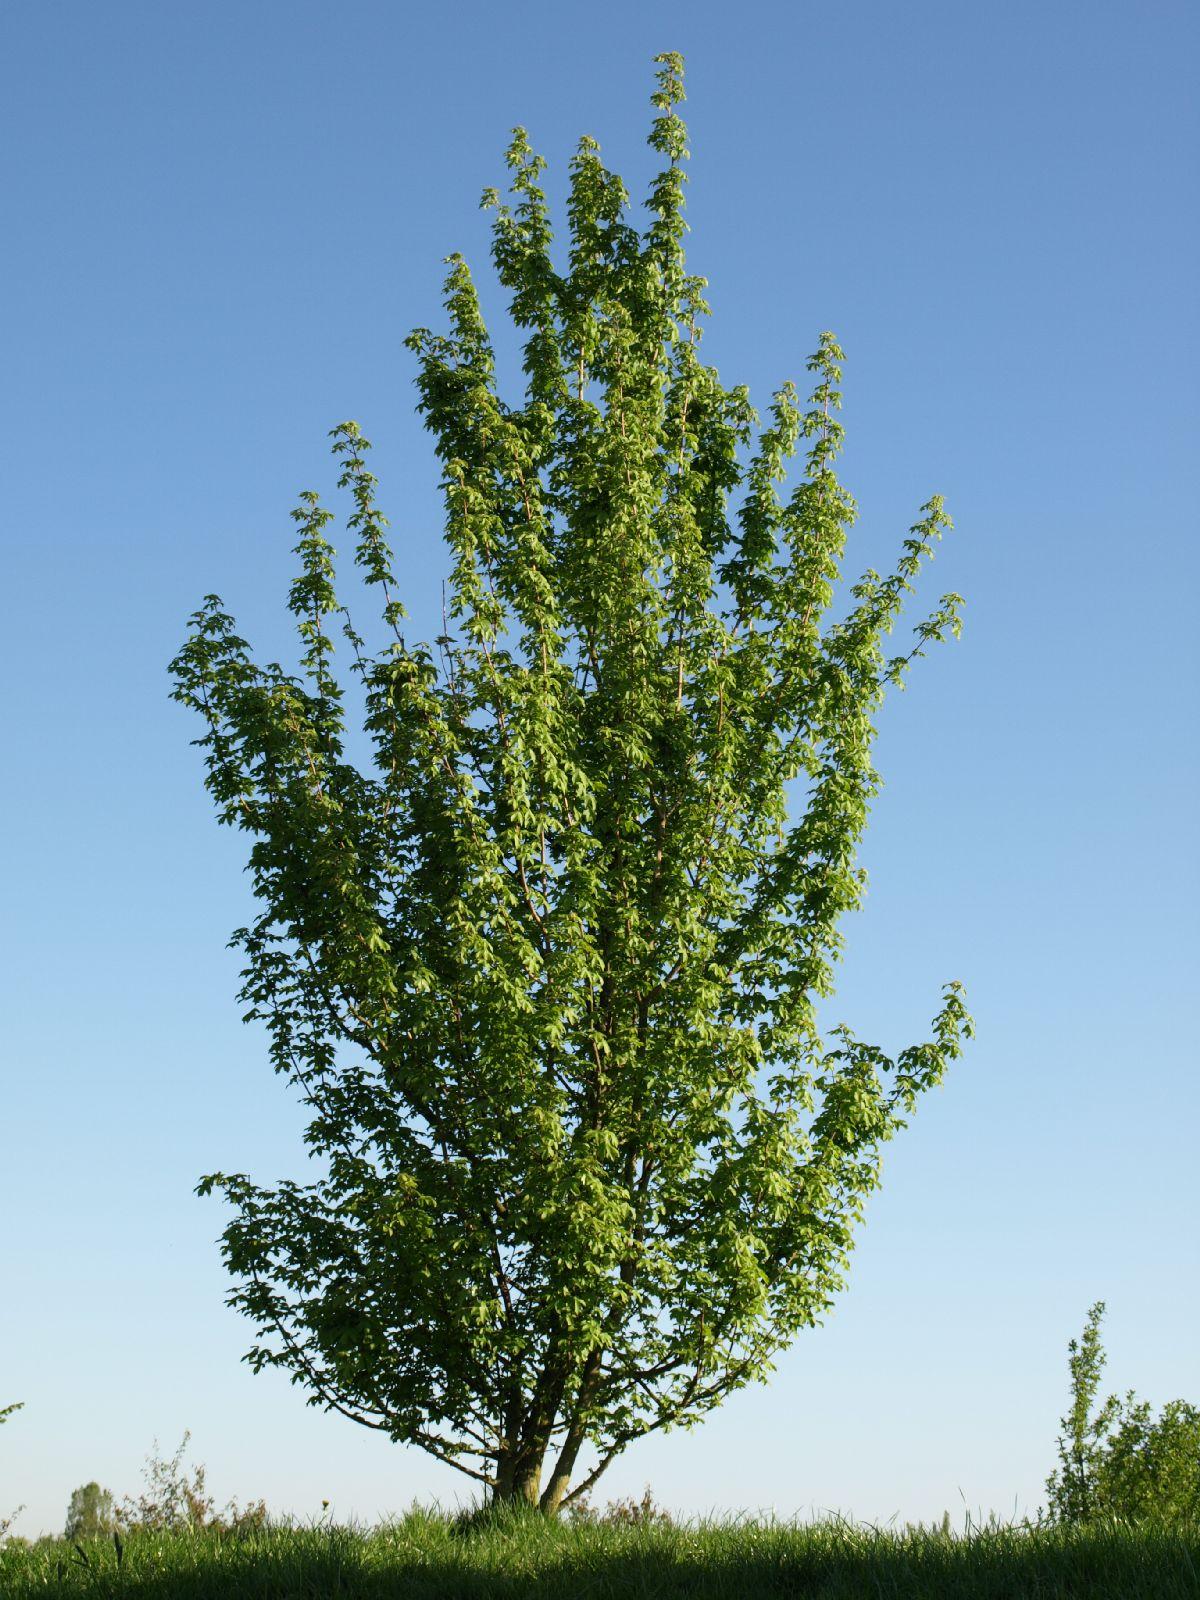 Plants-Trees_Photo_Texture_B_P5052550